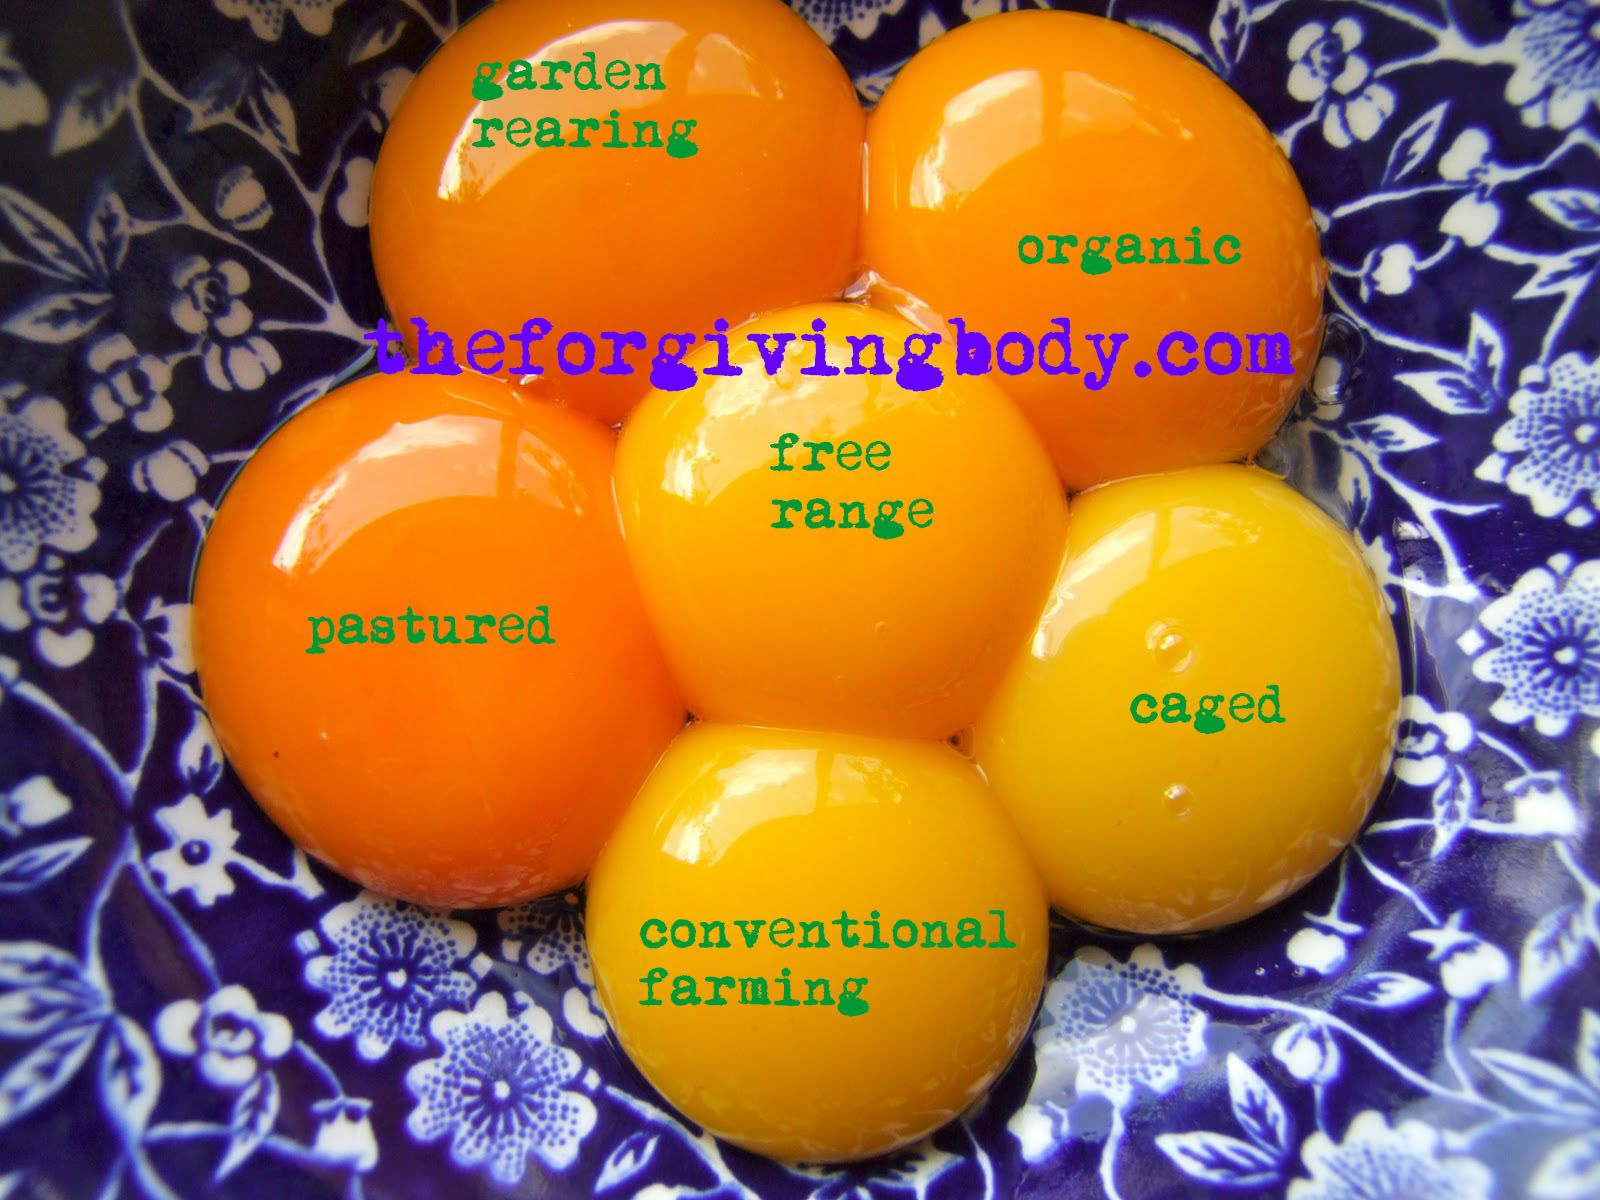 Free Range Vs Caged Eggs